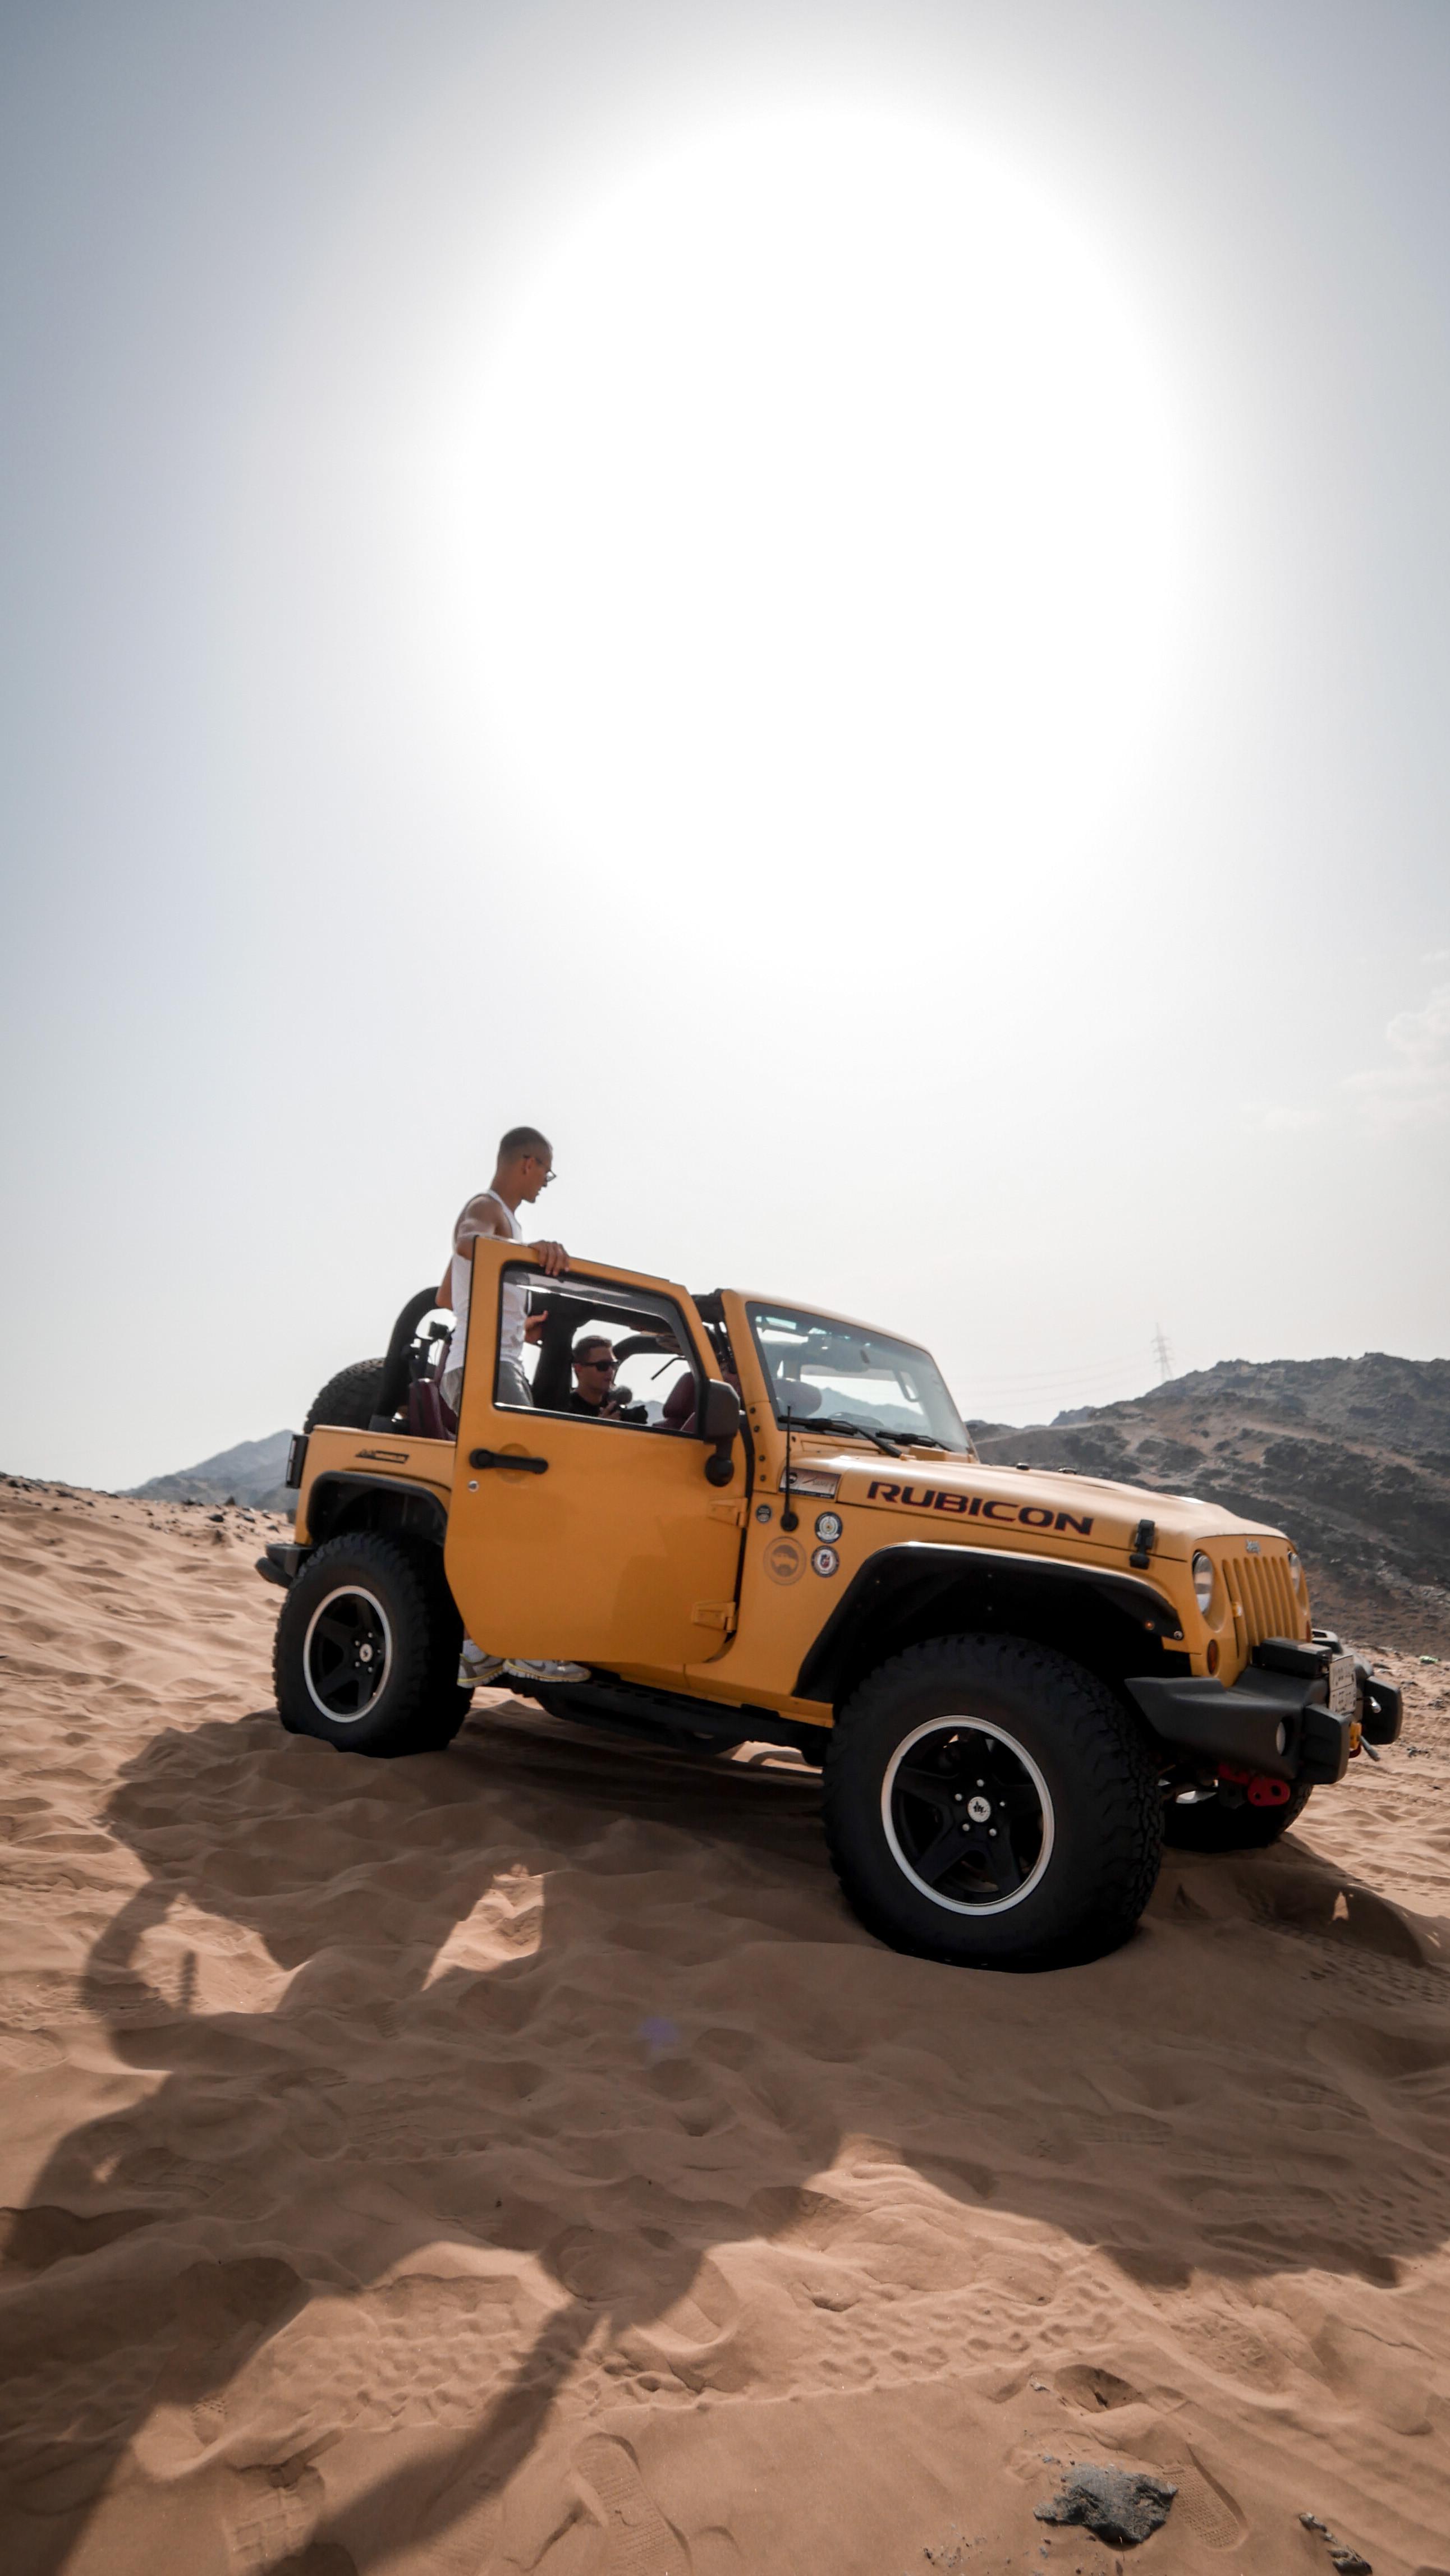 Desert Bashing Trip for 1 person